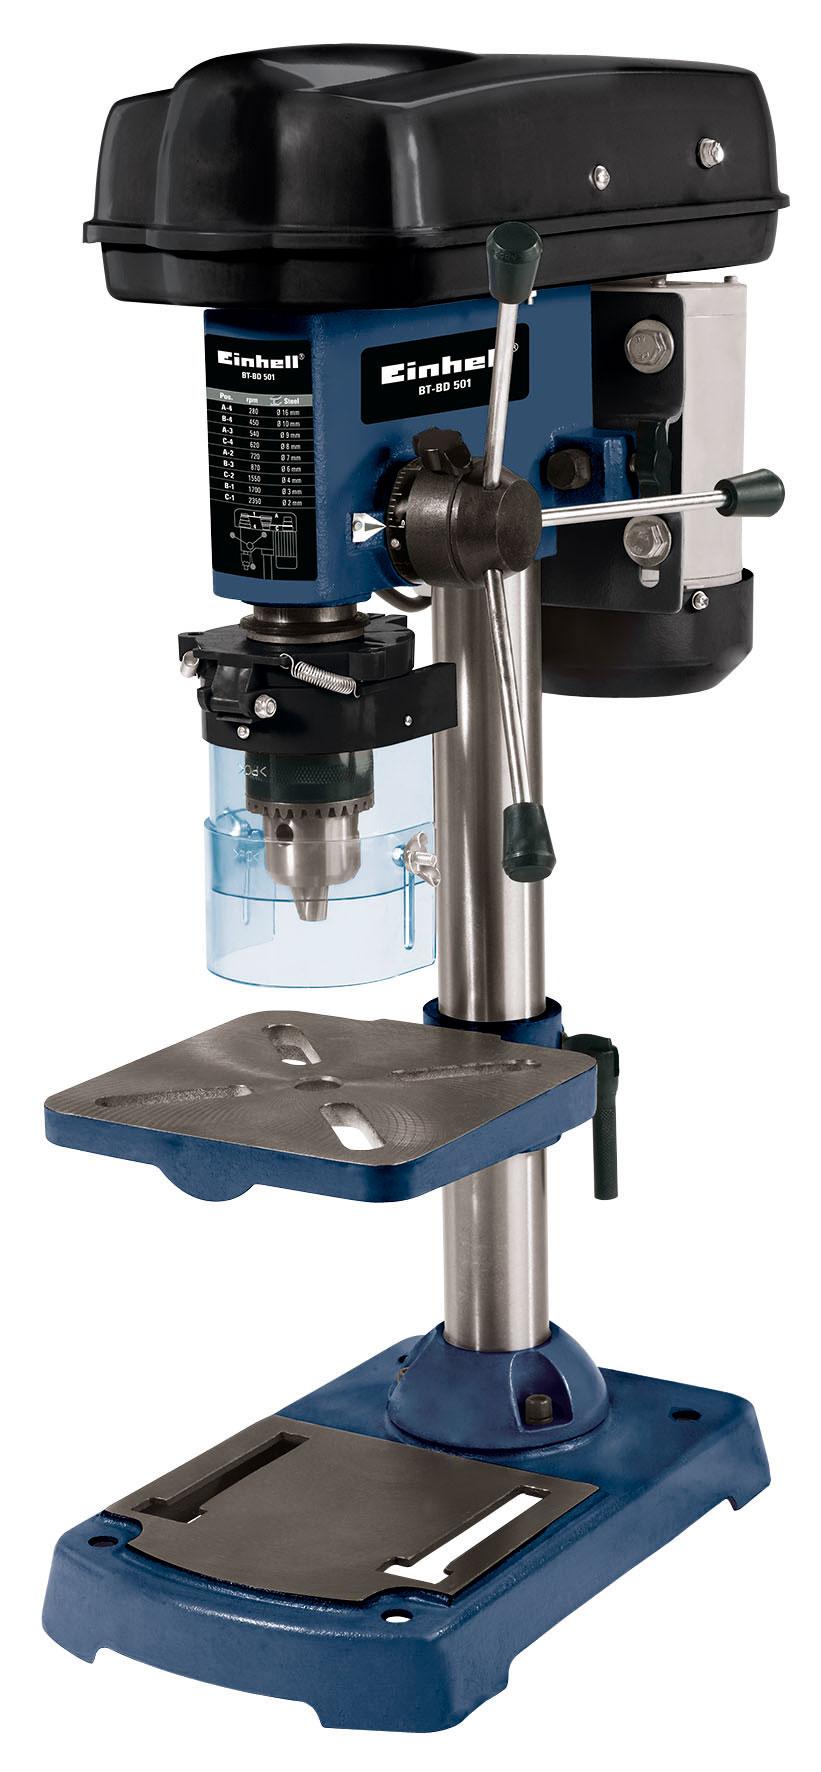 Einhell Säulenbohrmaschine BT-BD 501 500 Watt Bild 1